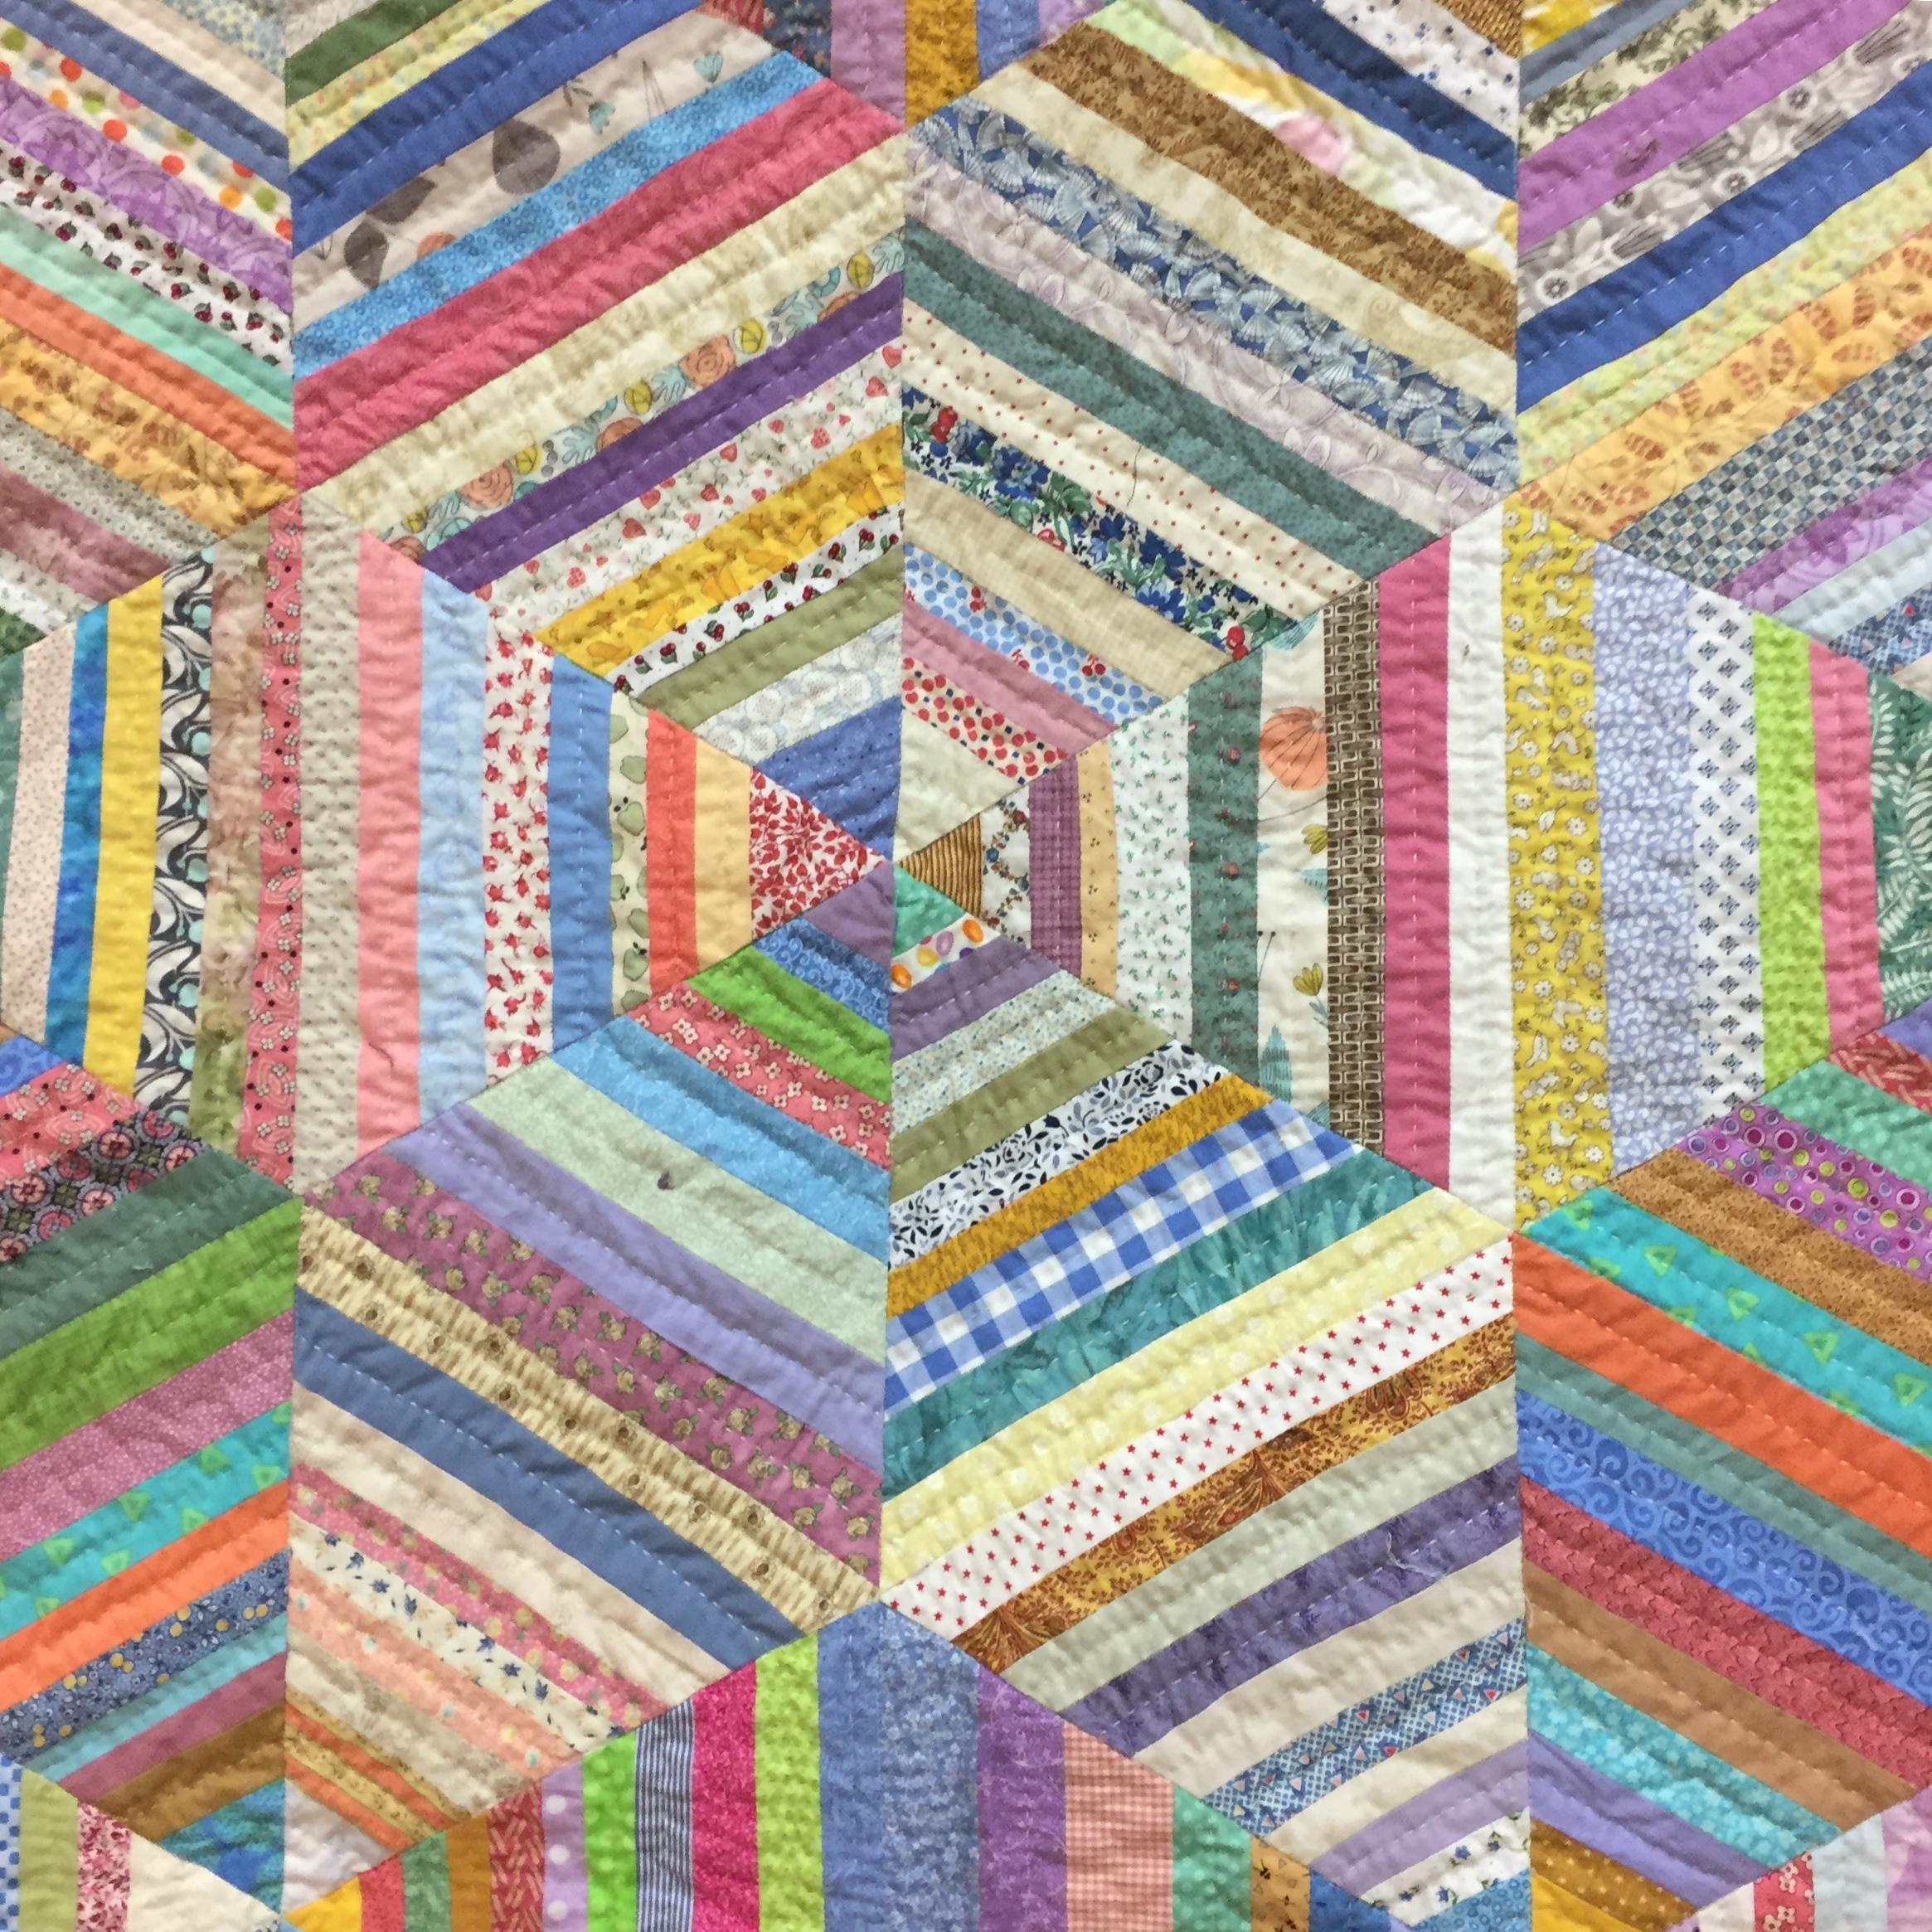 String quilt detail